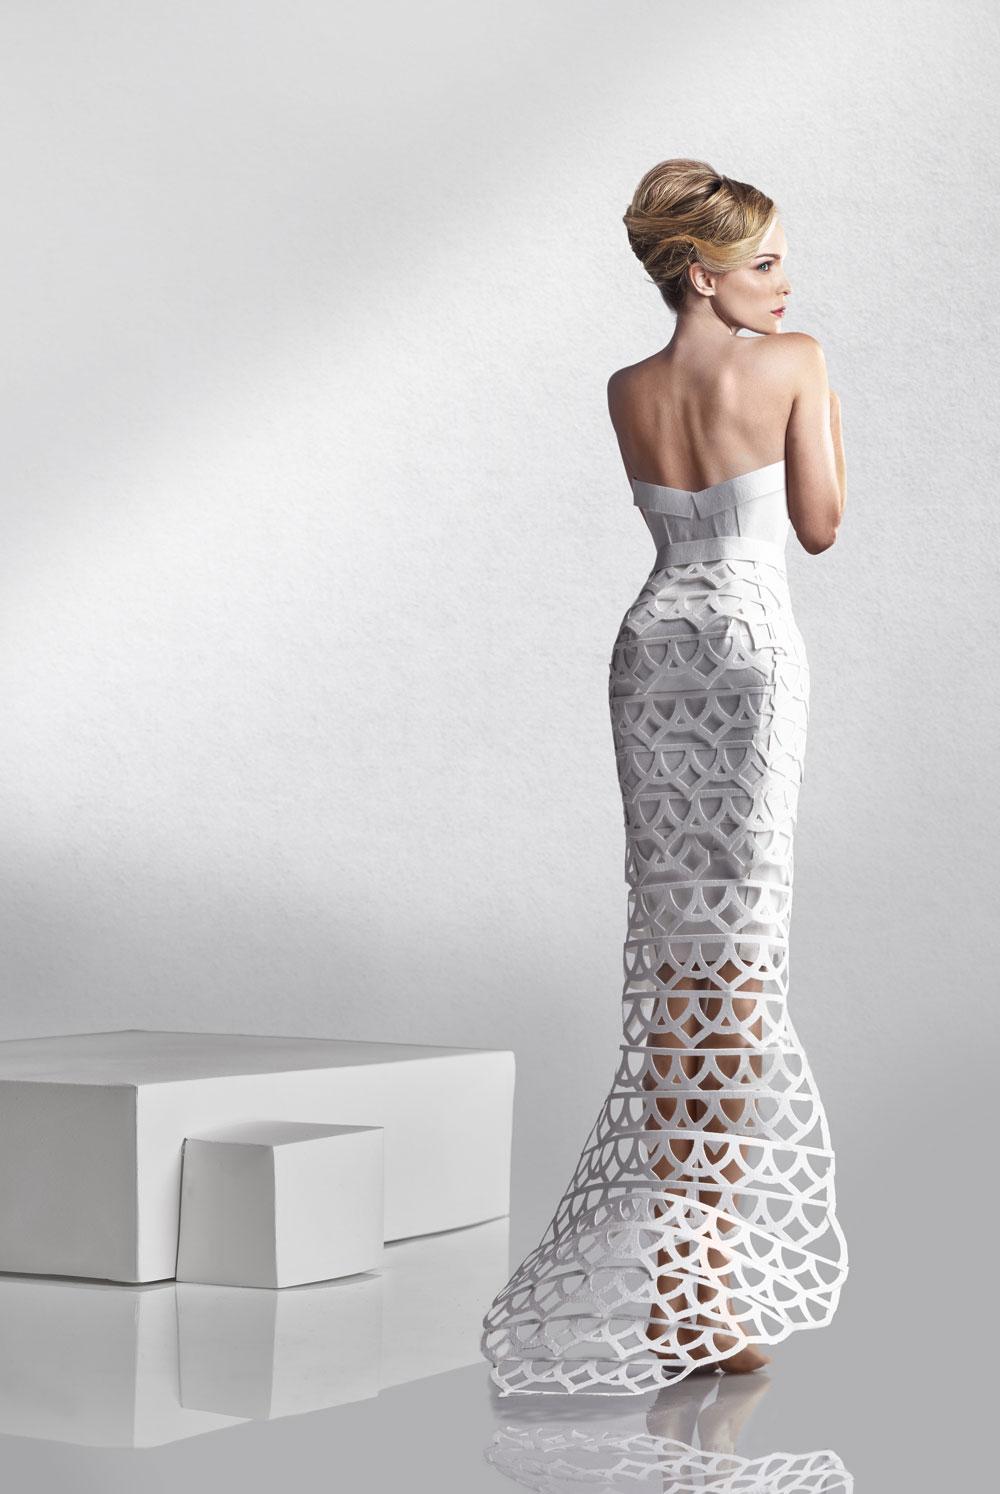 Cassie in geometric wedding dress